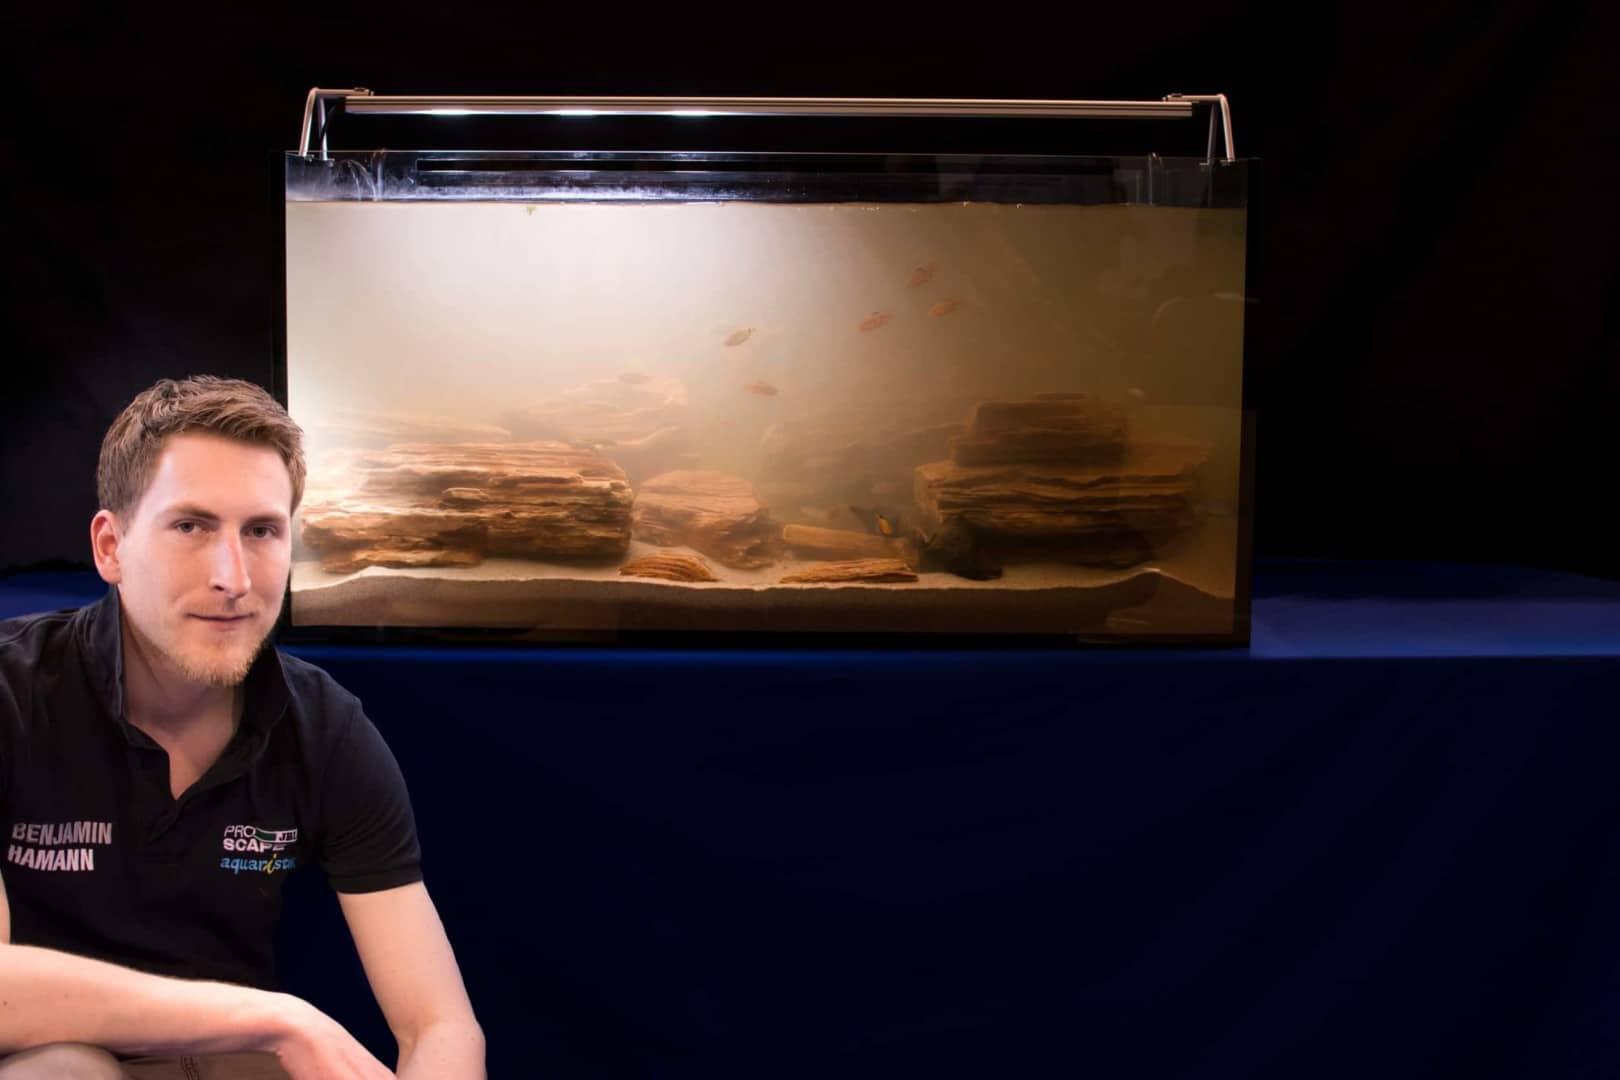 German Biotope Aquarium Contest (GBAC) - Mach mit! 2